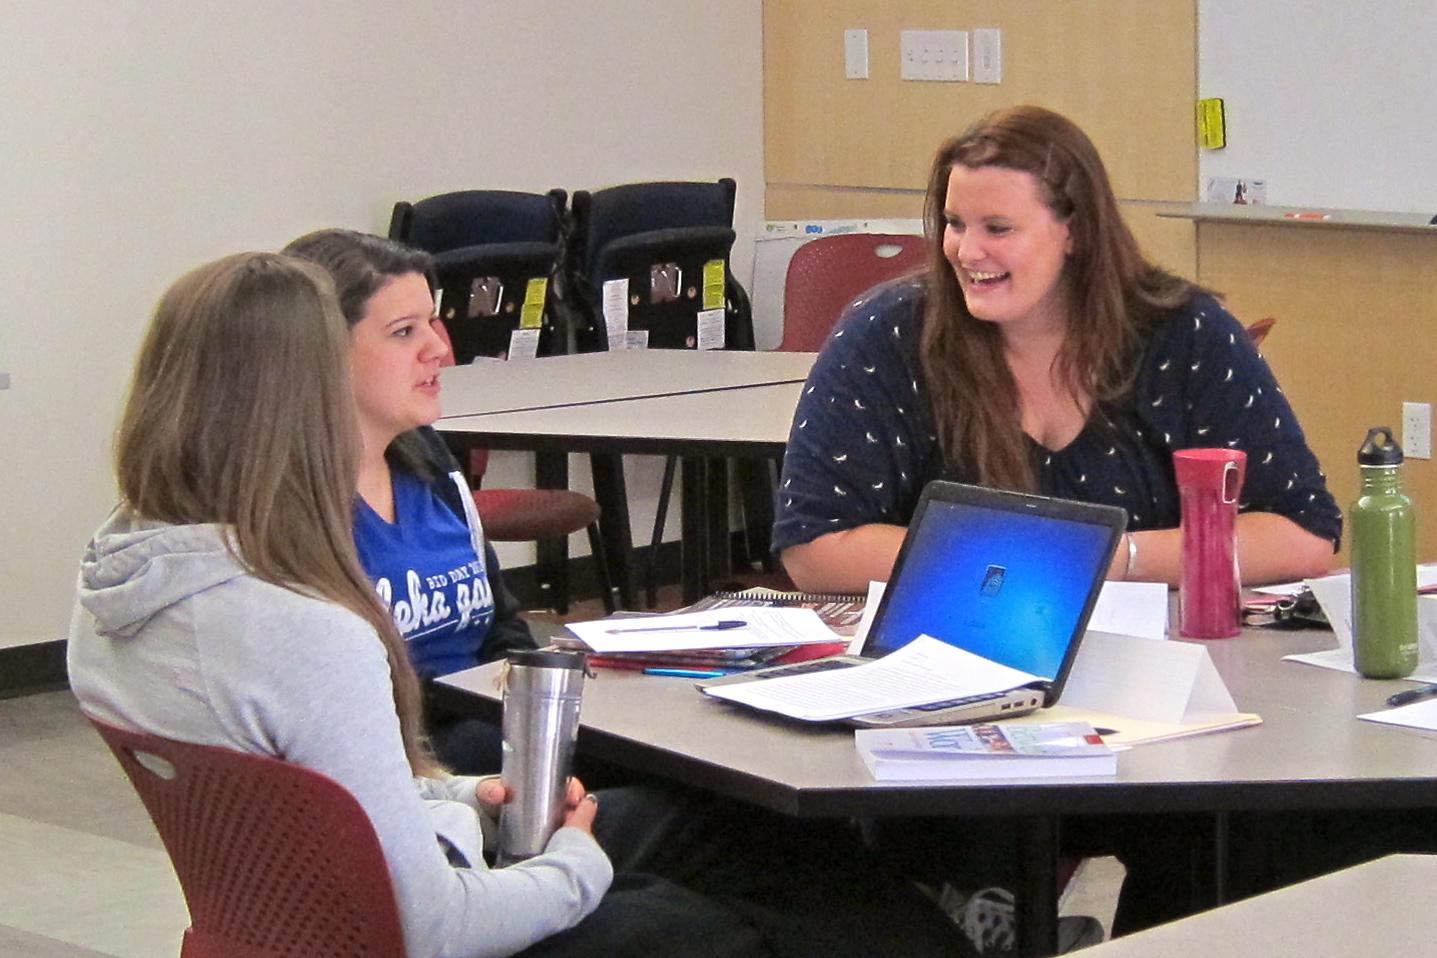 Adult assessment education evaluation self self